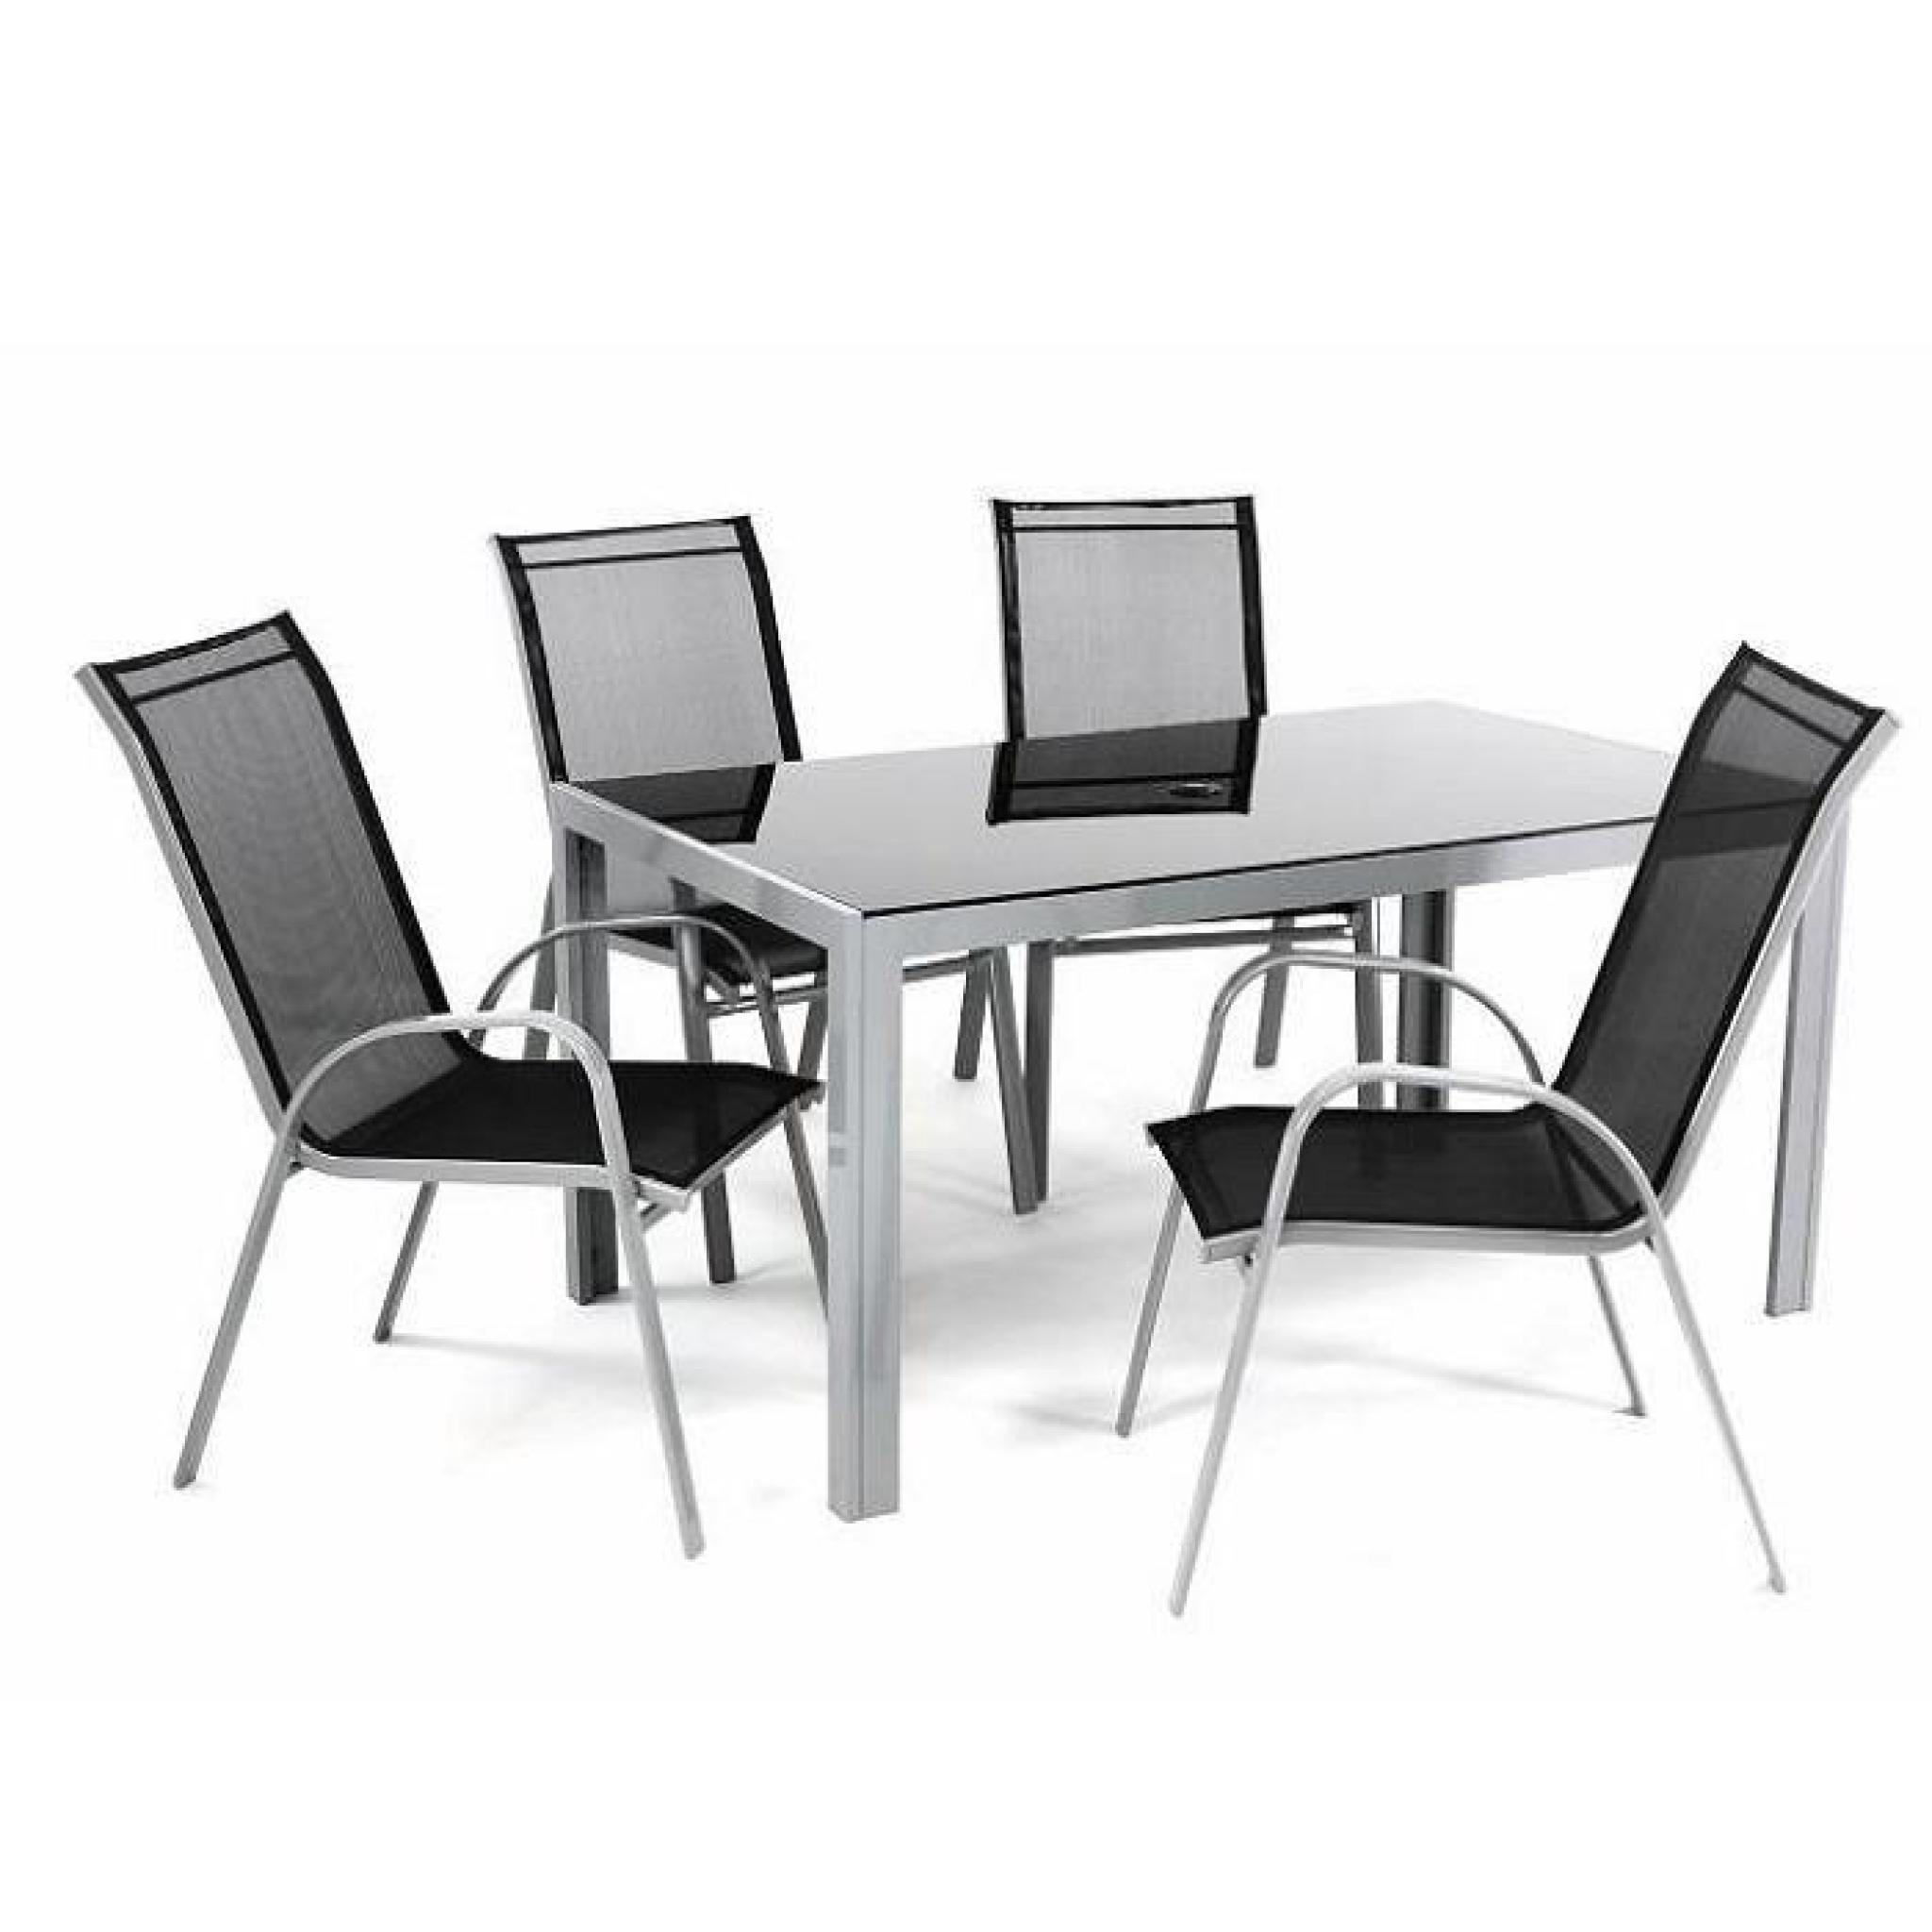 Salon de jardin 4 places en textilène table rectangle alu verre